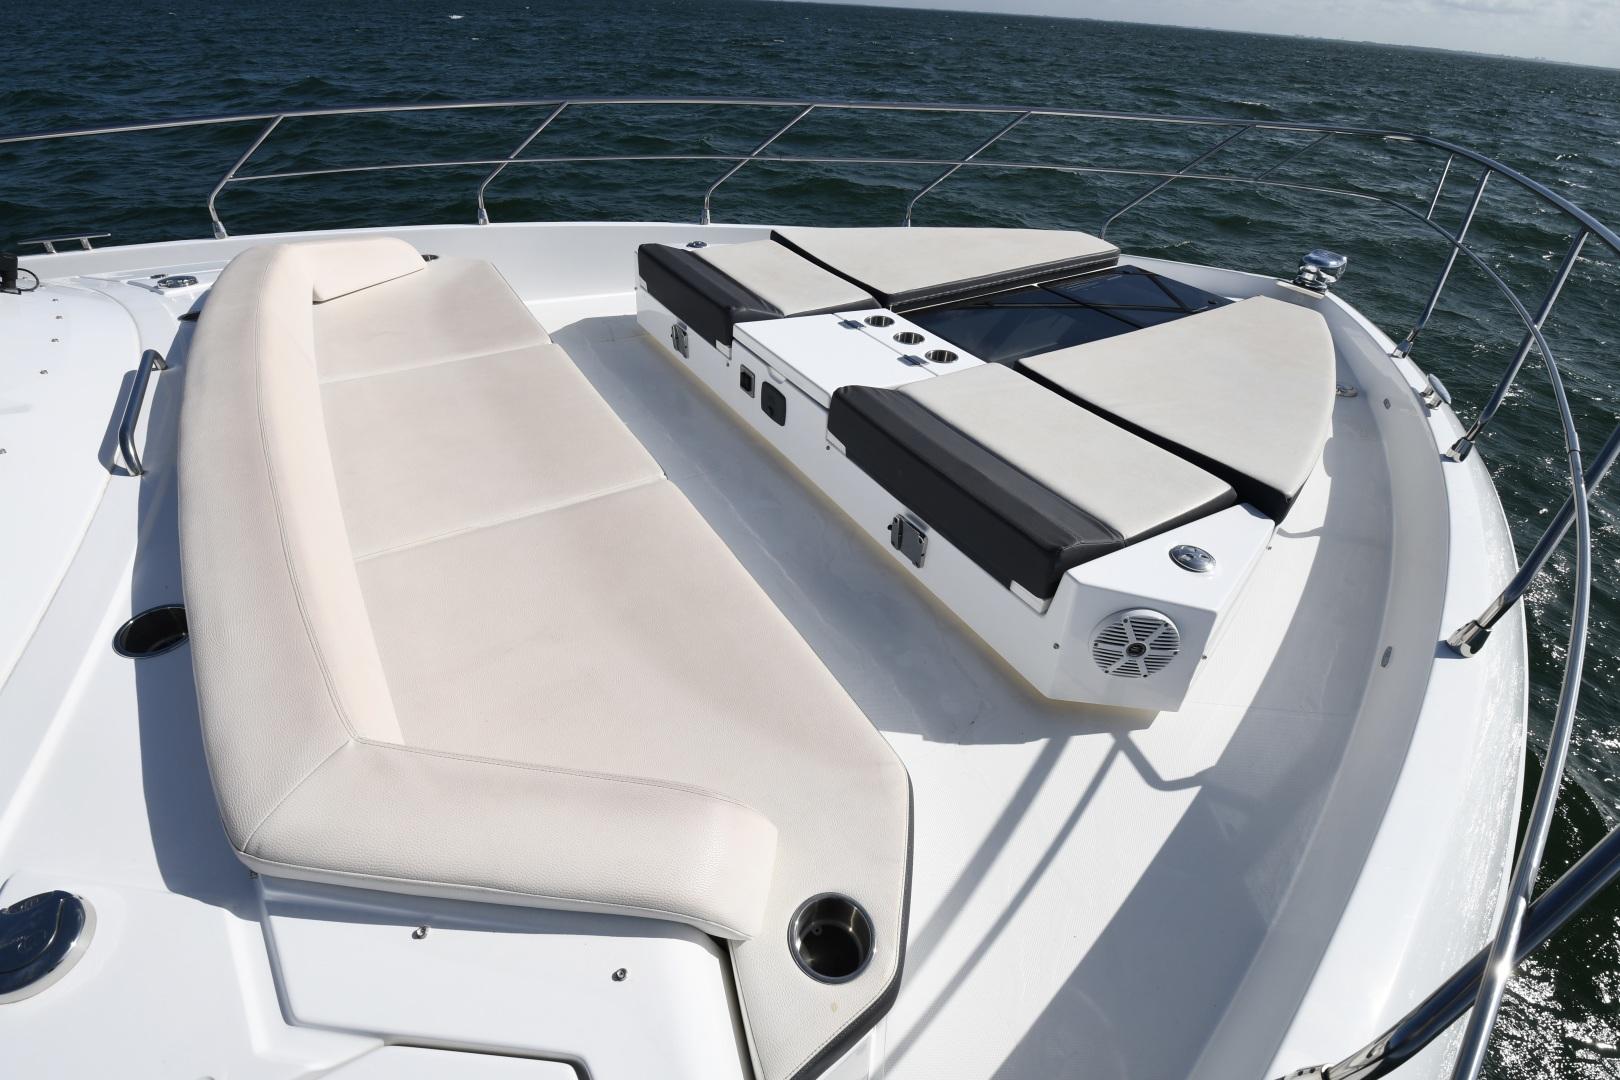 Cruisers-60 Cantius 2017-Mrs. Robinson Anna Maria Island-Florida-United States-2017 Cruisers 60 Cantius  Mrs. Robinson  Foredeck Seating-1538518 | Thumbnail